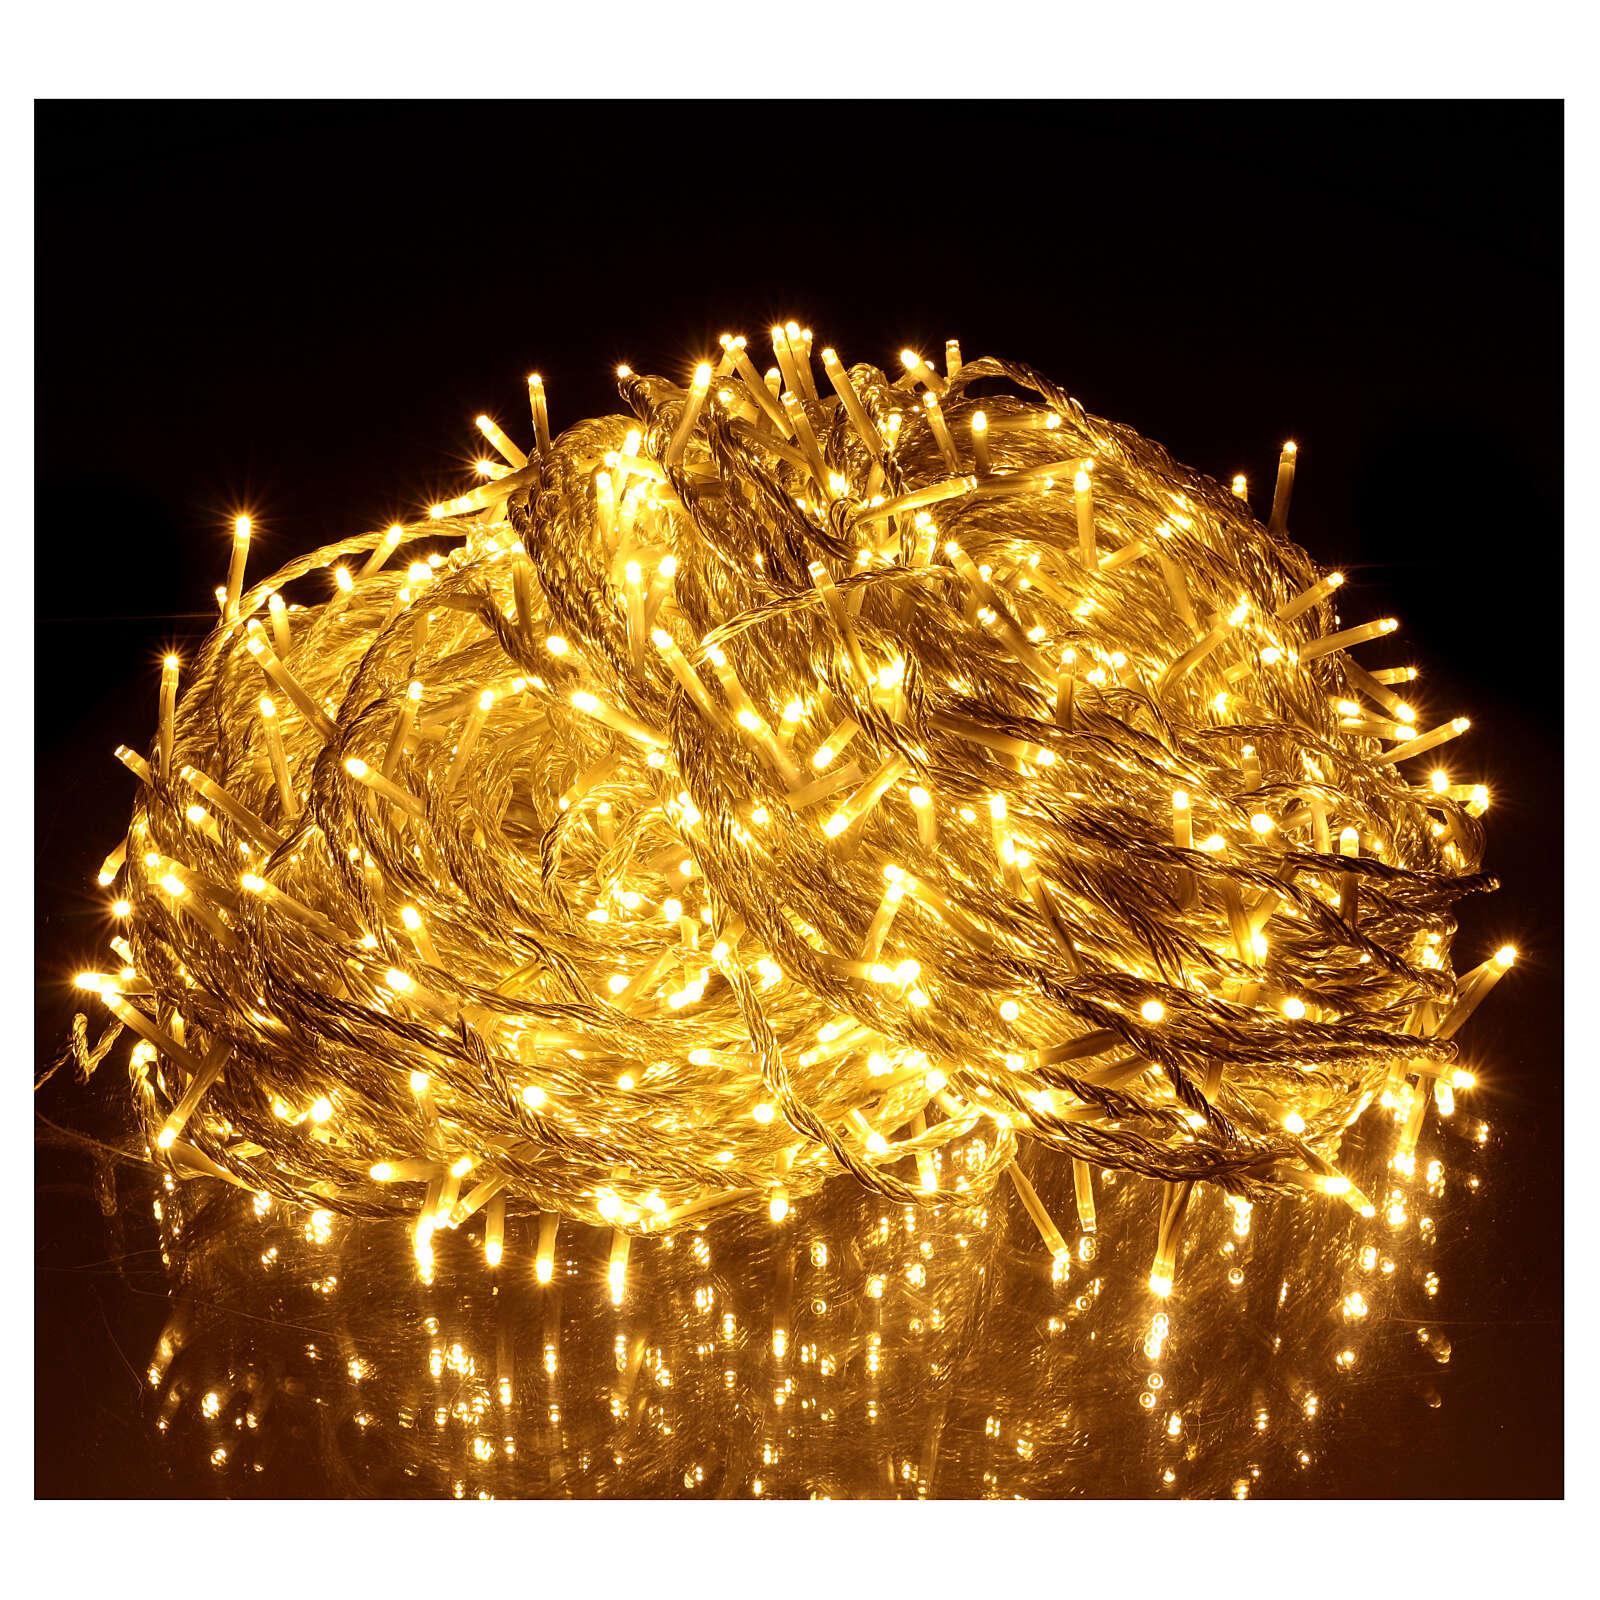 Christmas string lights, 1000 warm white LEDs flash control unit 100 m 3